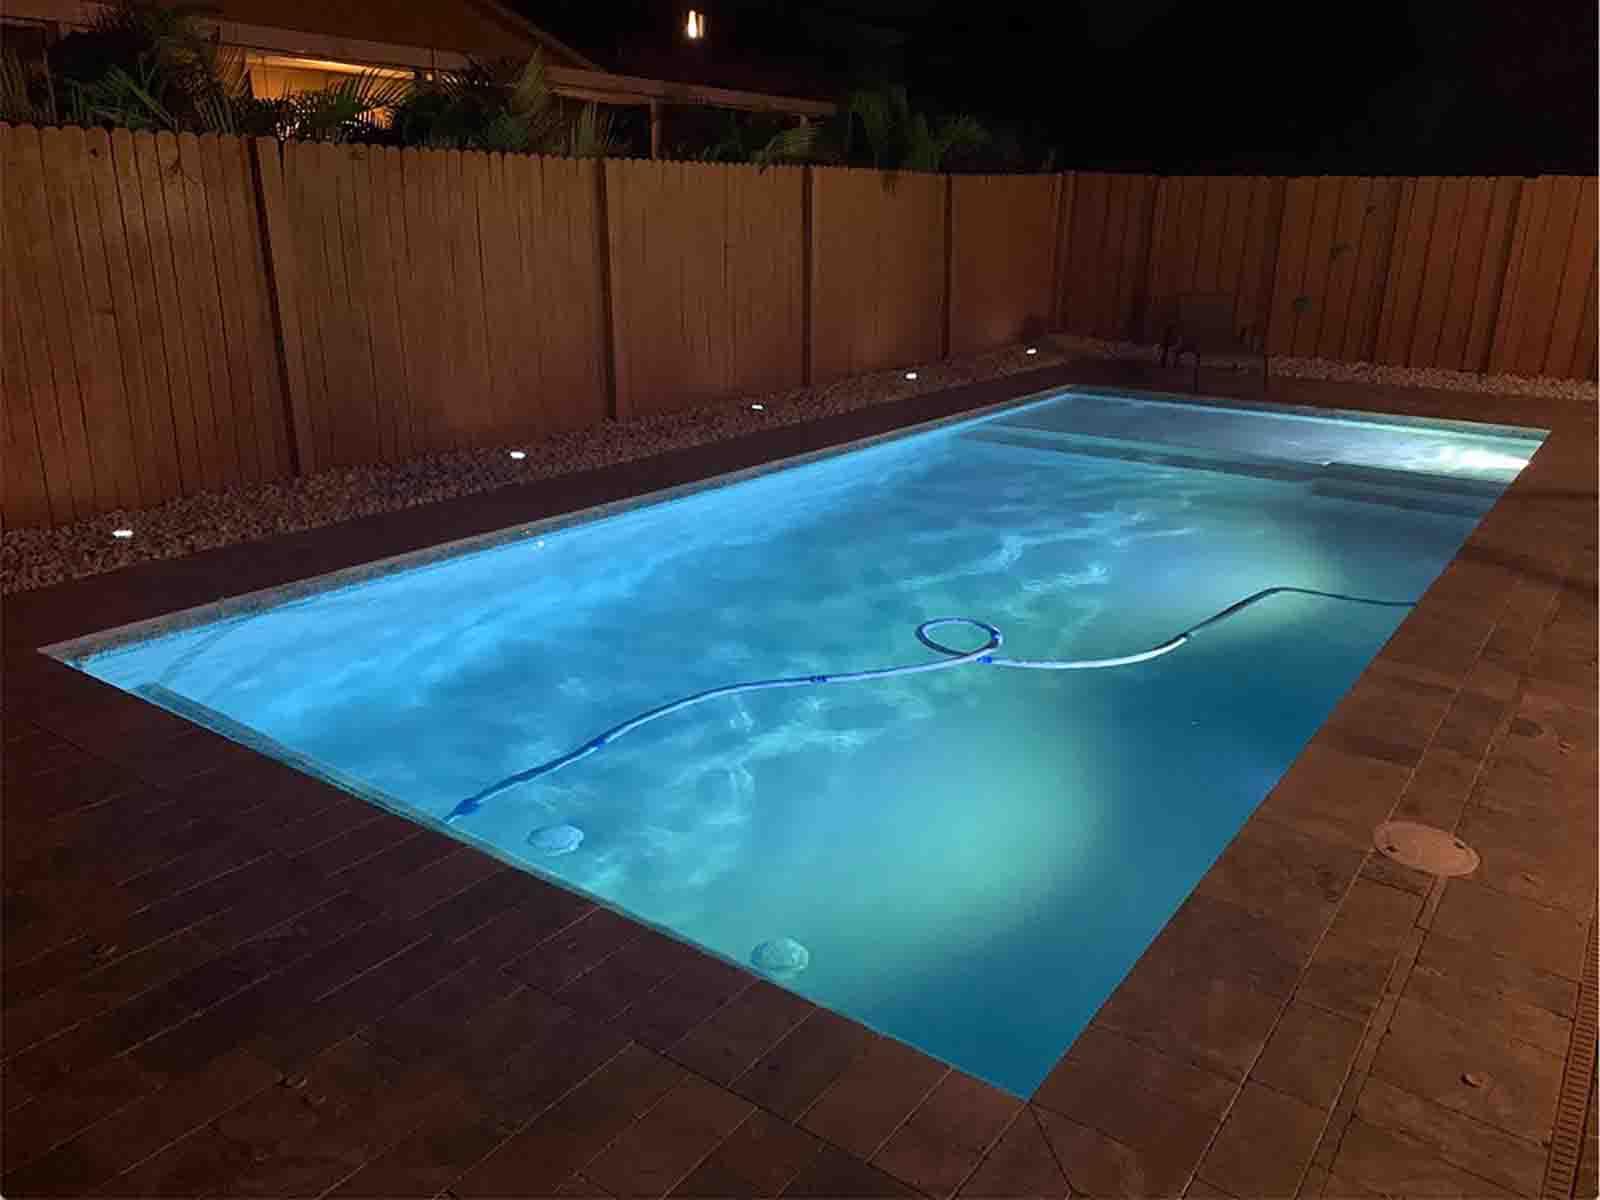 pool_contractors_miami_inground_pool_at_night_2